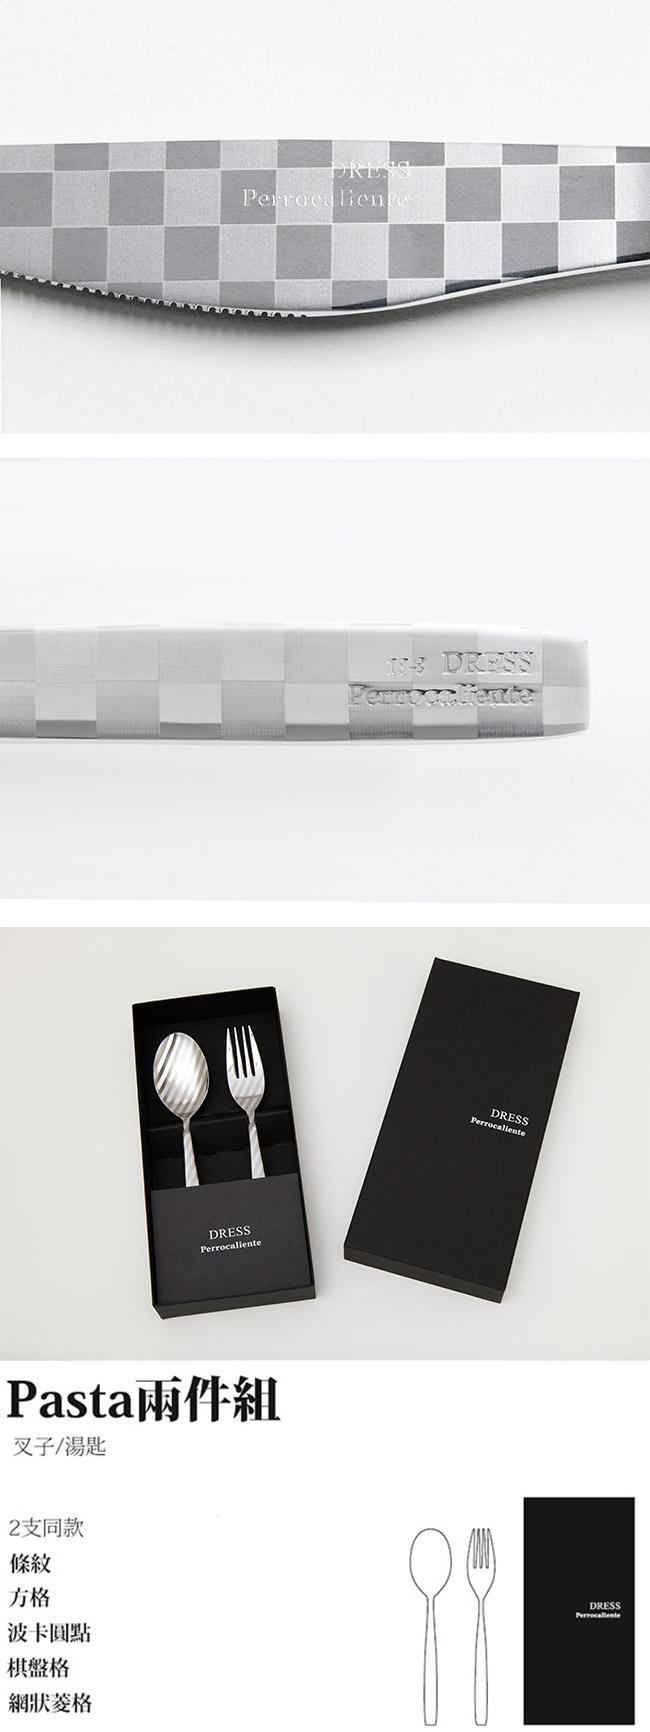 Perrocaliente Dress Gift Set 銀色盒裝餐具組 Pasta兩件組 棋盤格 (湯匙+叉子)